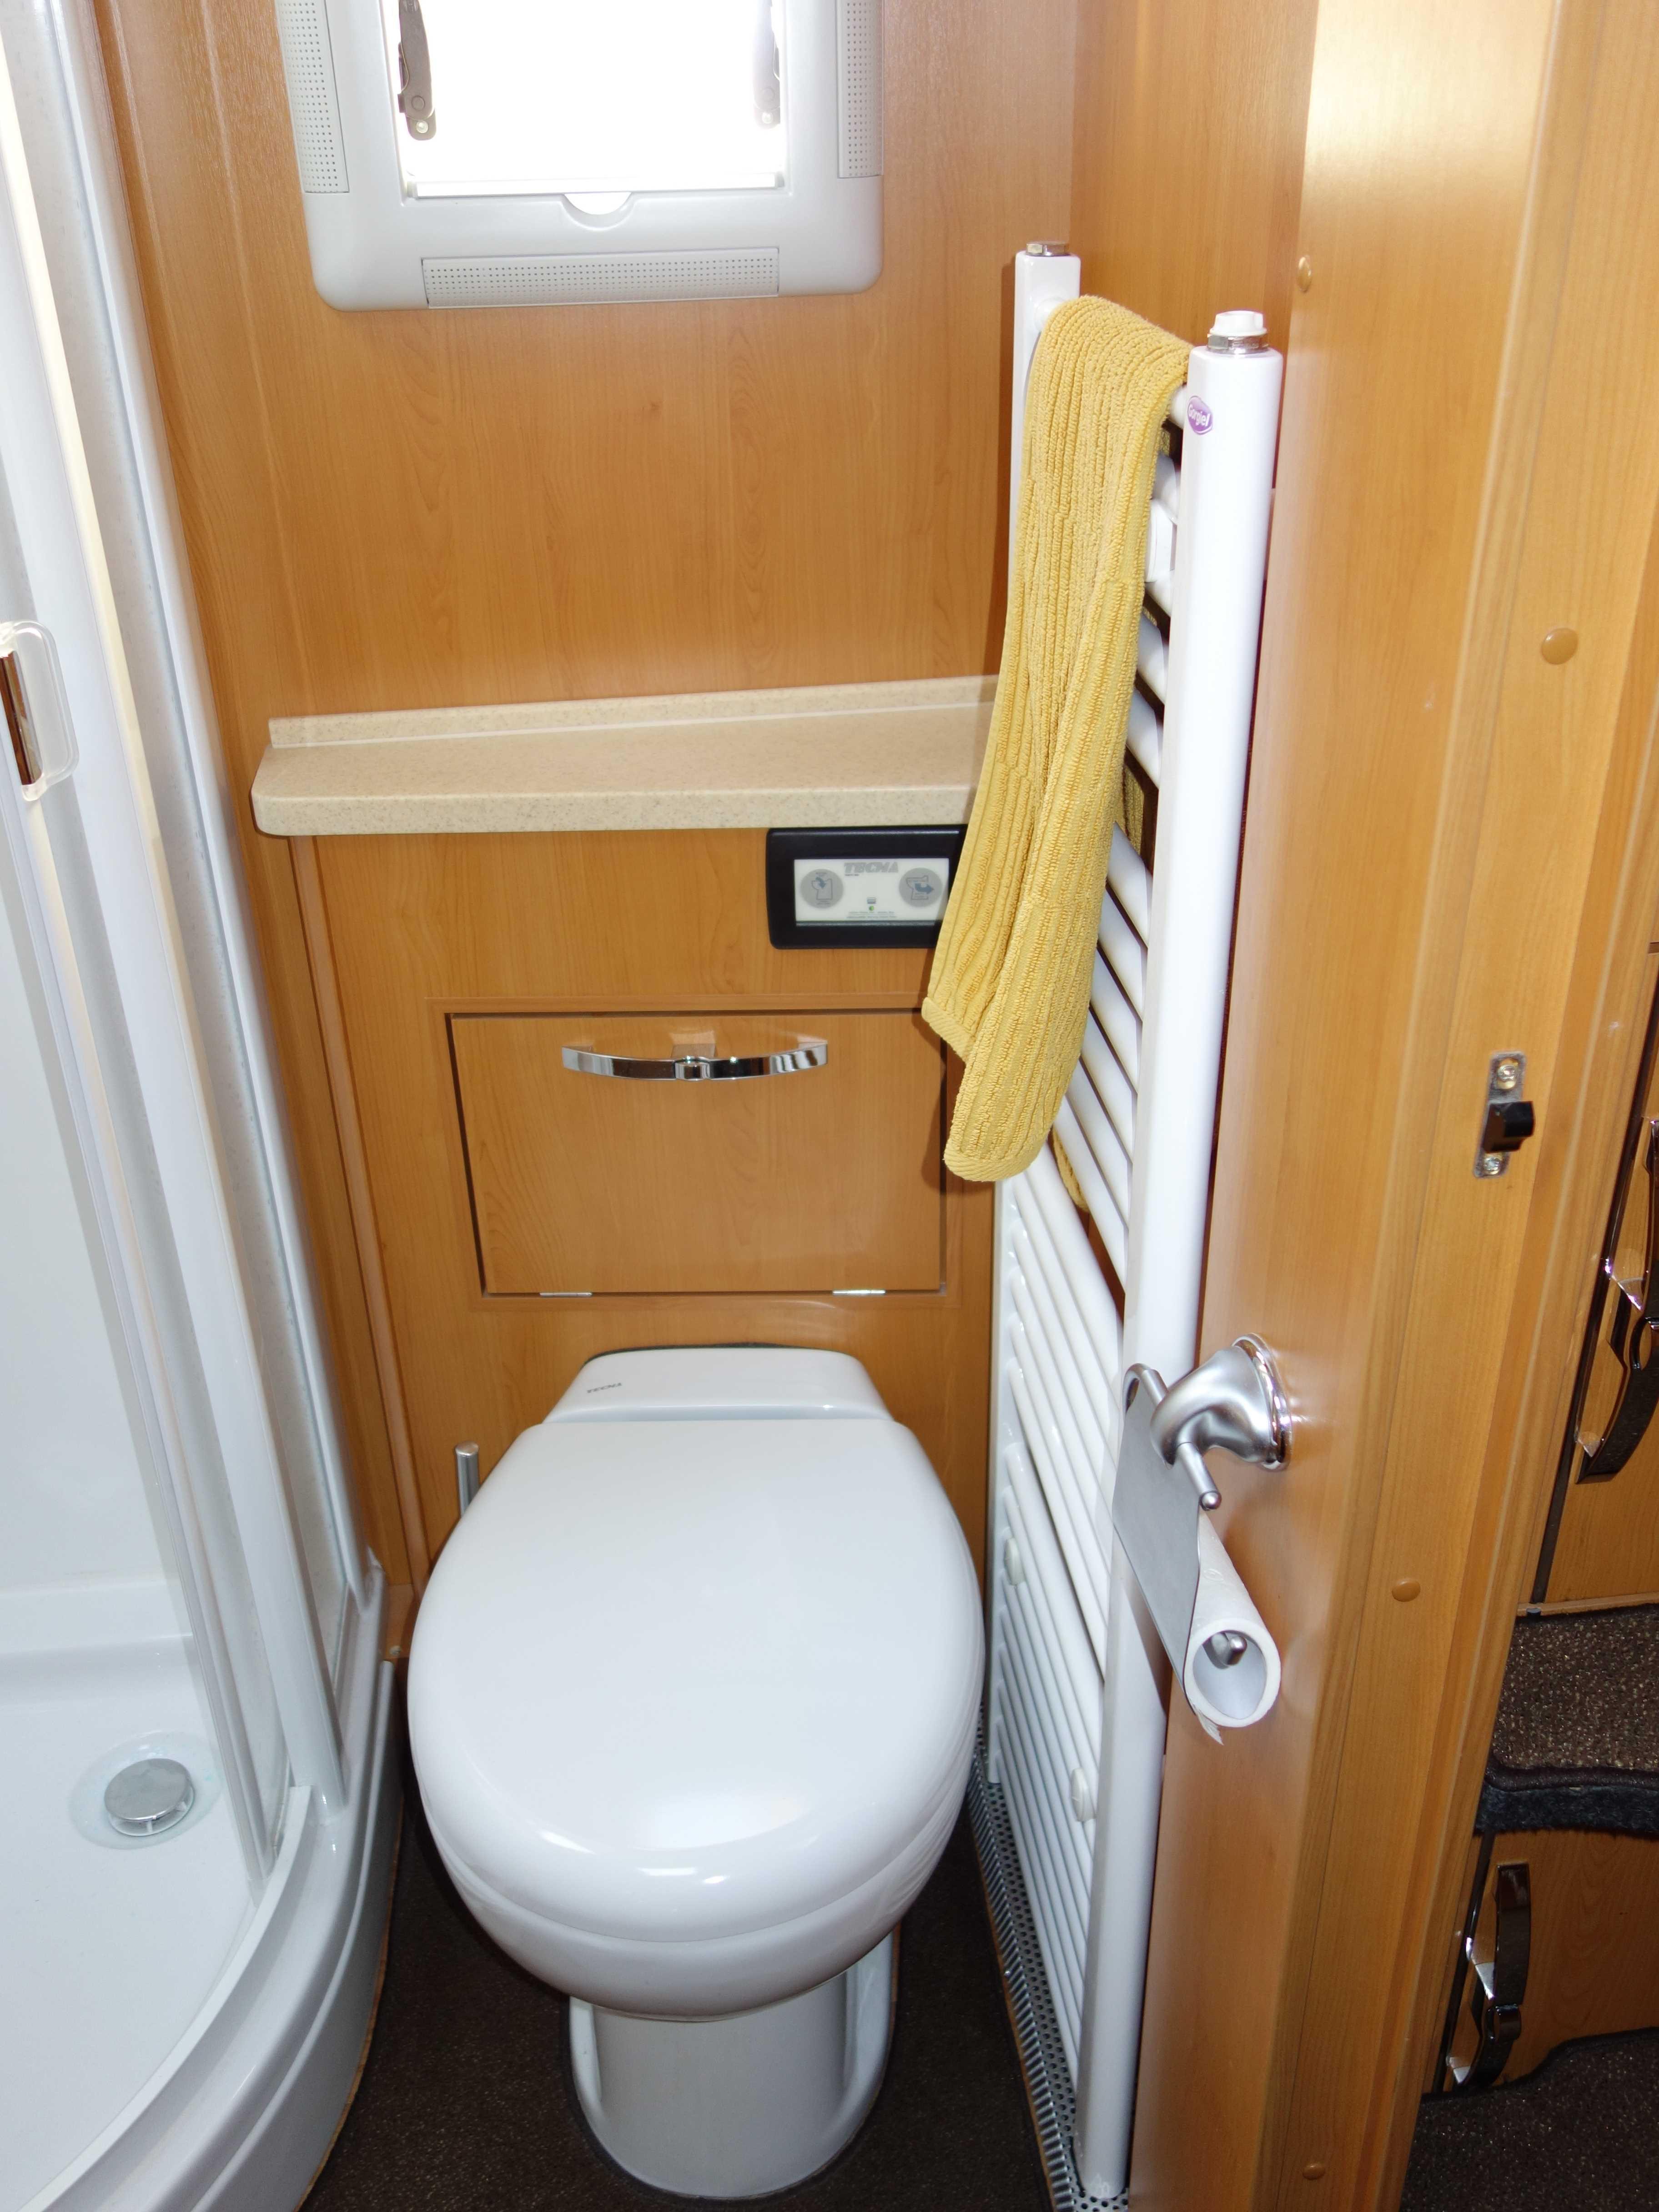 PhoeniX 8000 Toilette